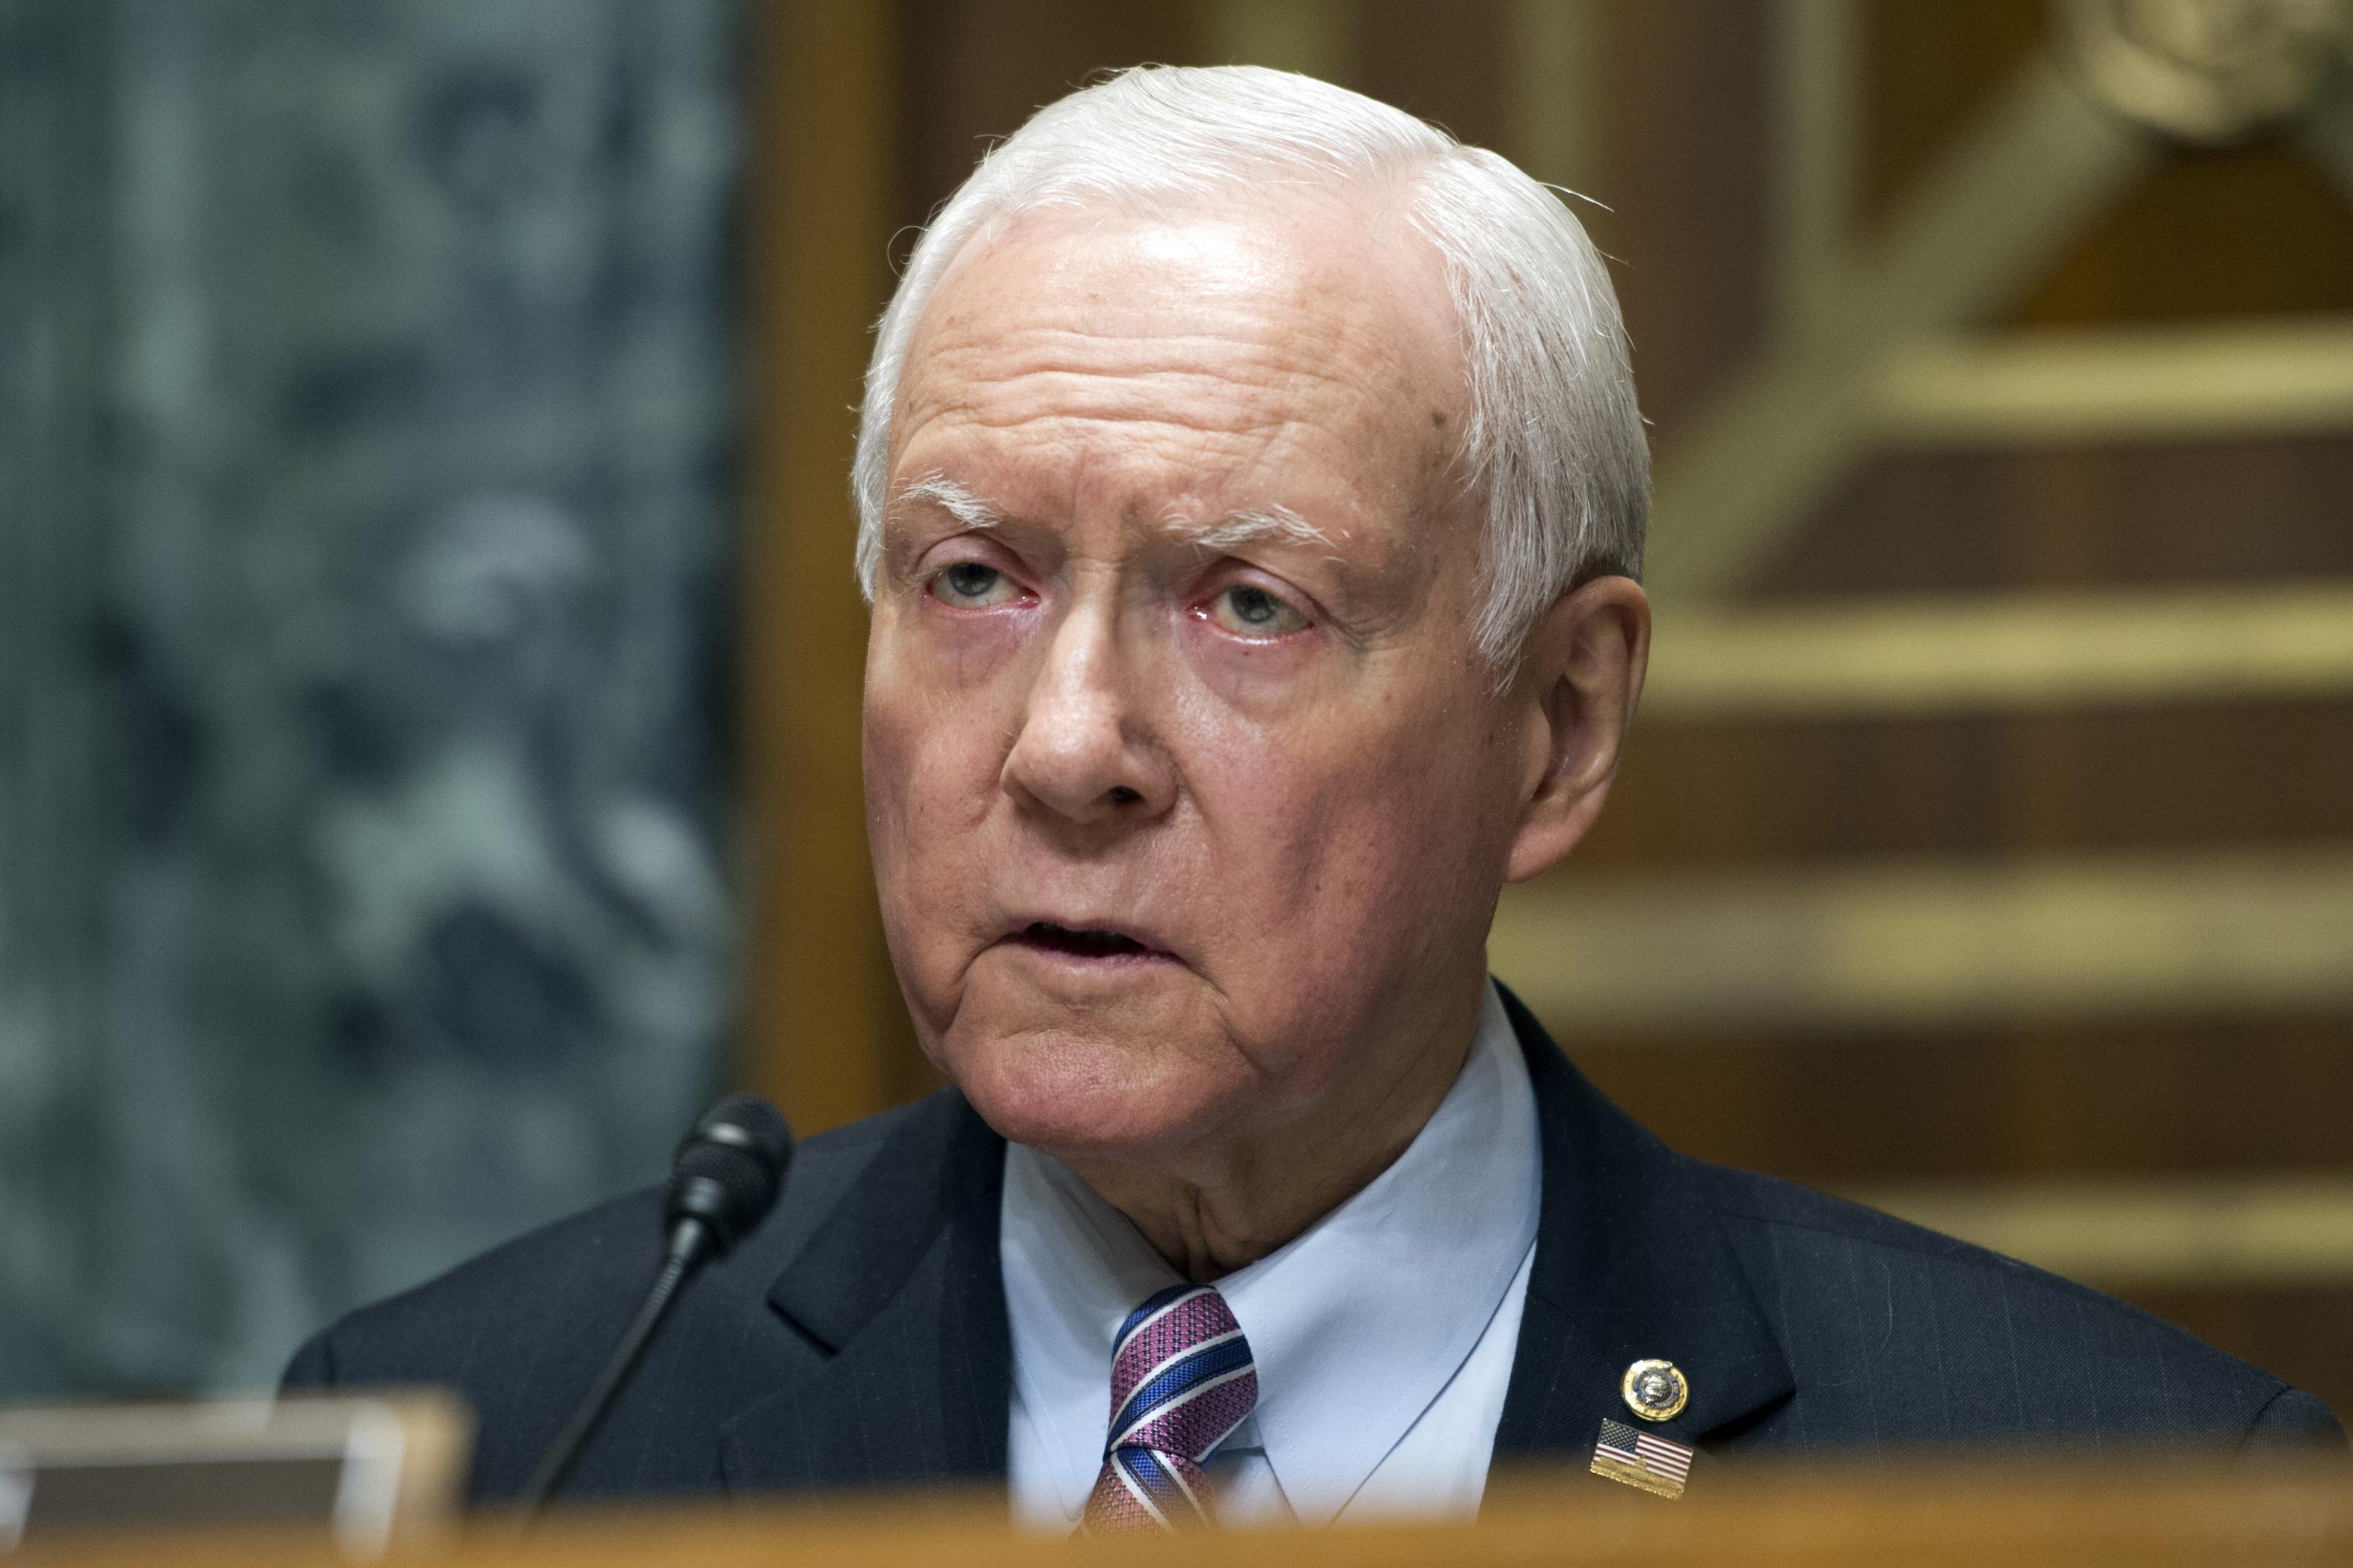 Orrin Hatch slams Dems for tying tax reform to debt limit - Washington Times  sc 1 st  Washington Times & Orrin Hatch slams Dems for tying tax reform to debt limit ... 25forcollege.com